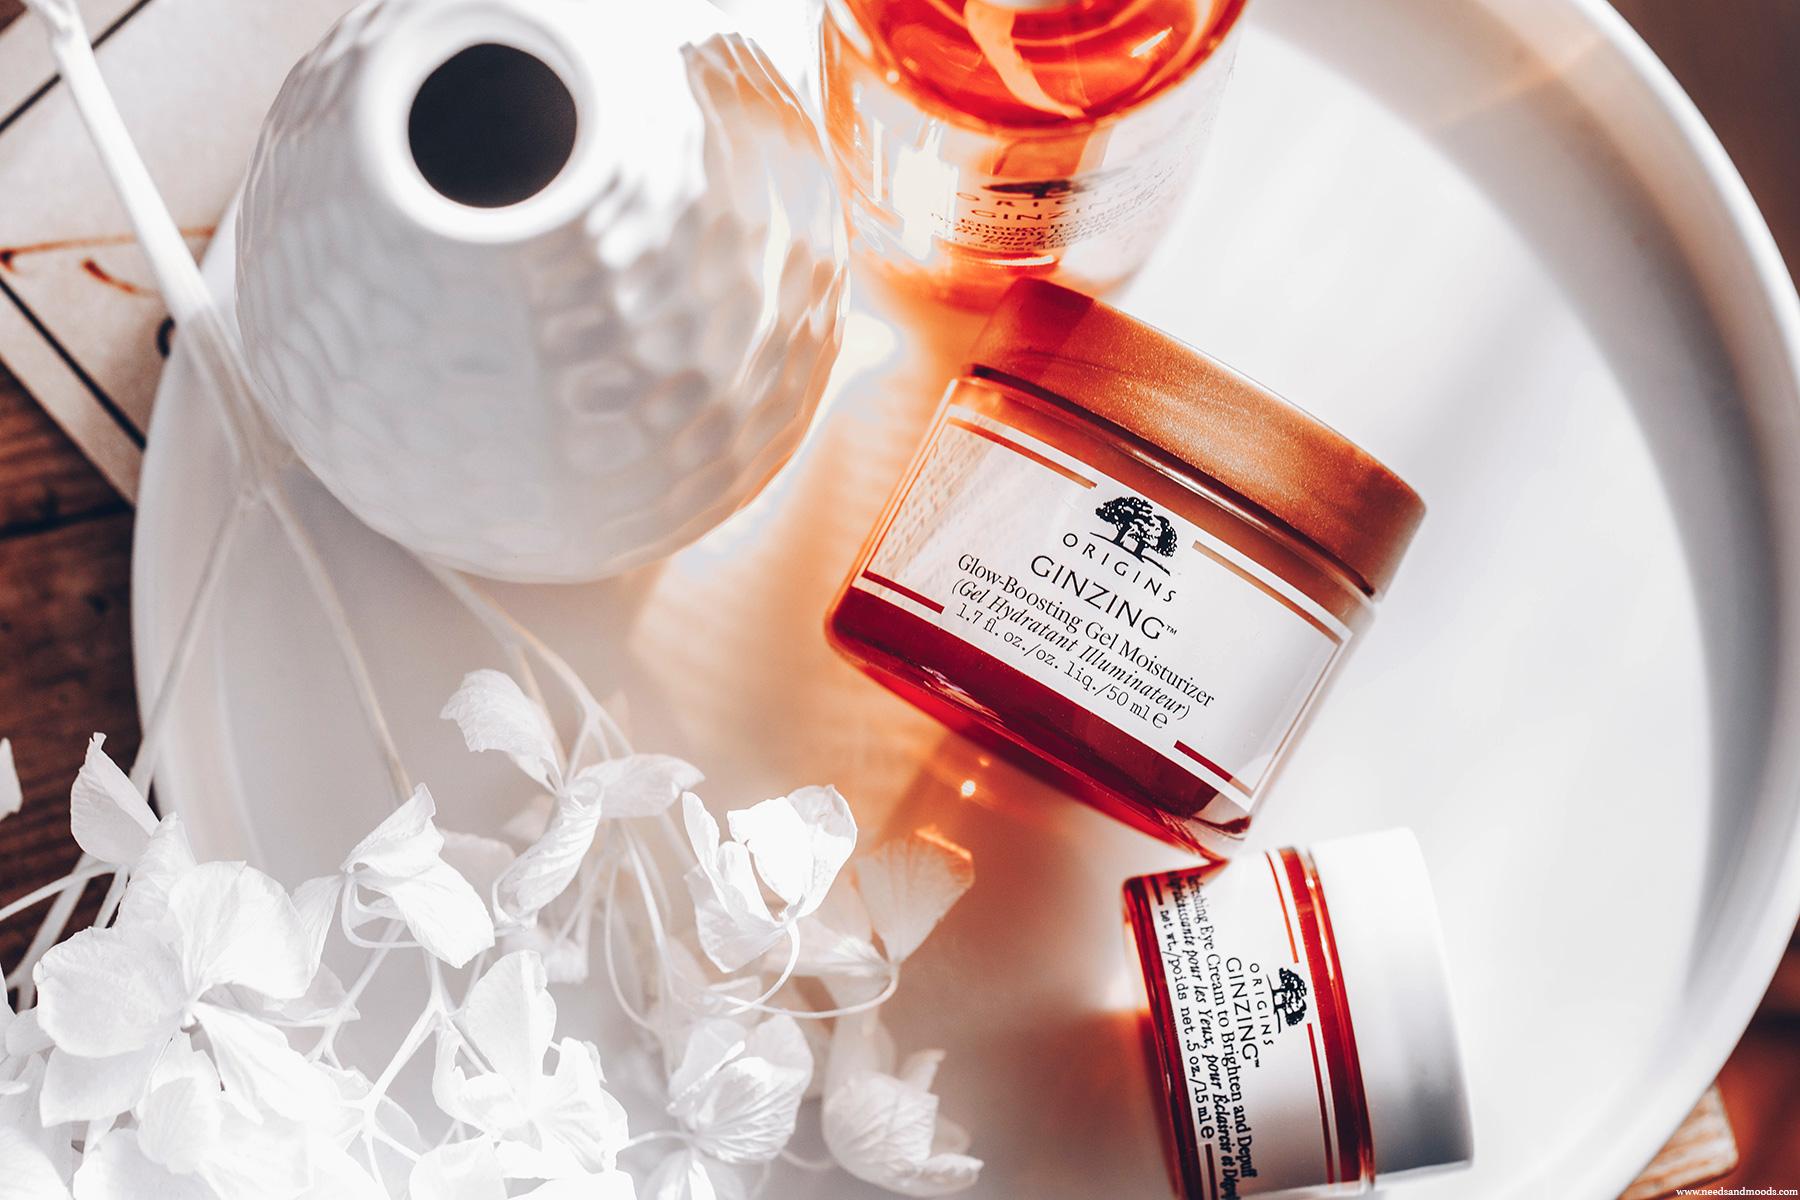 origins ginzing glow boosting gel moisturizer avis